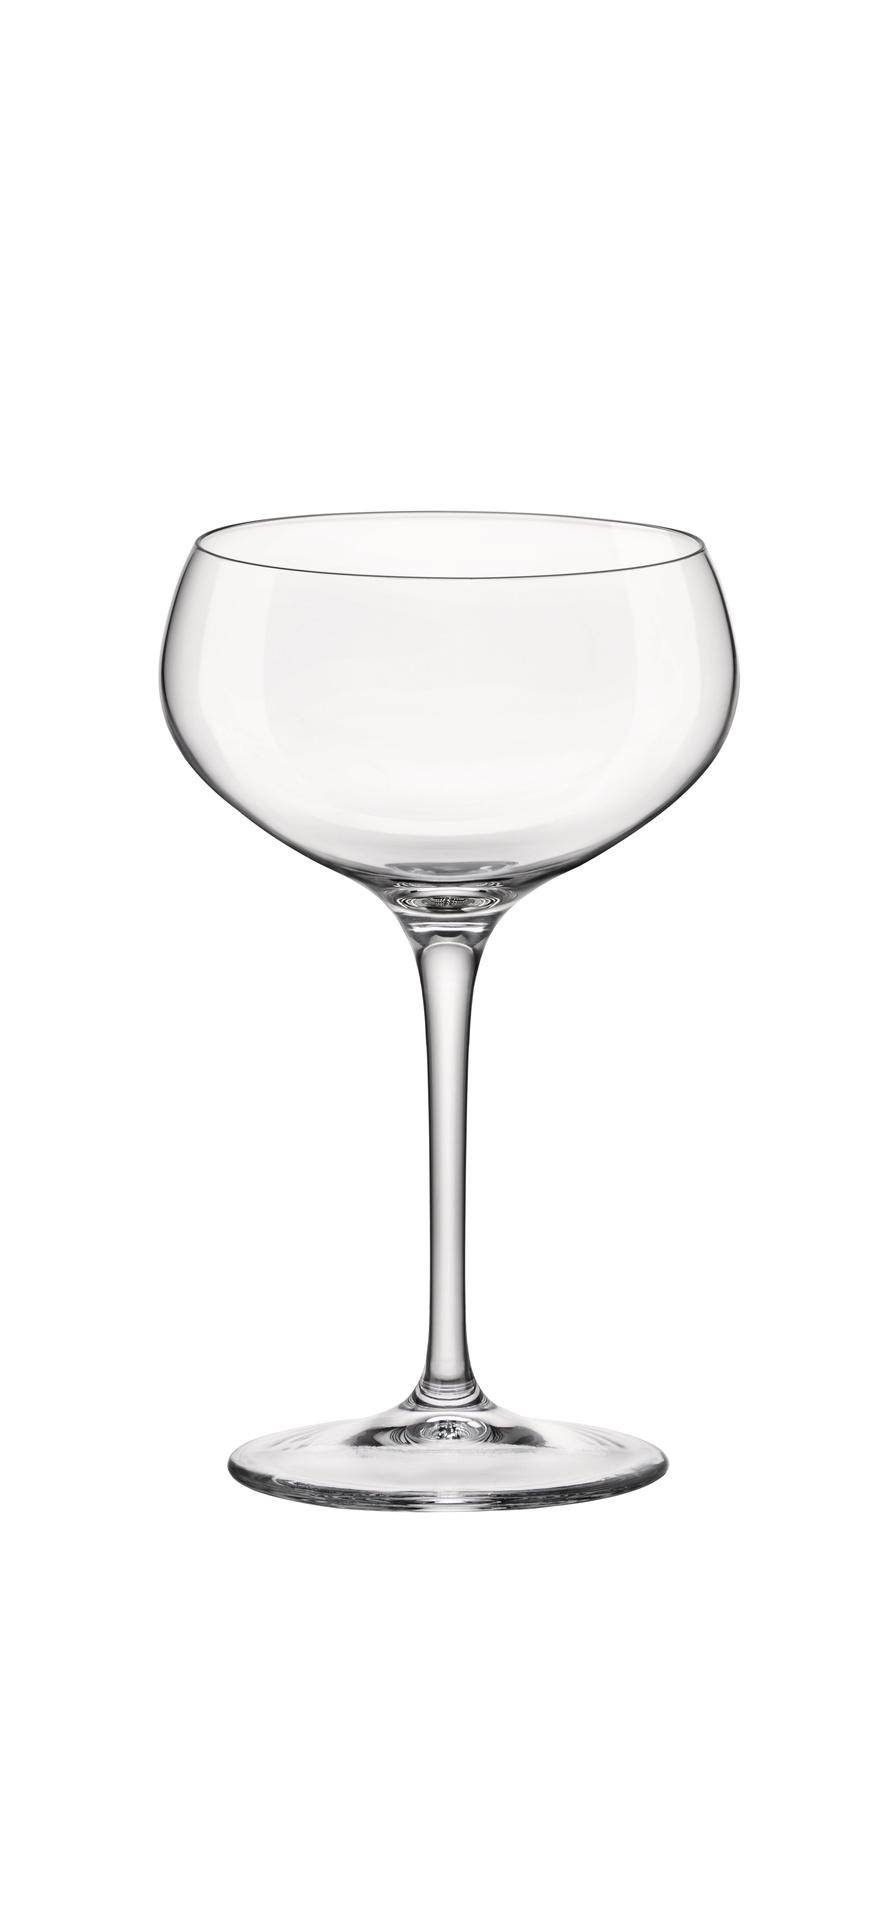 Sklenice na šampaňské 30,5 cl - Champagne